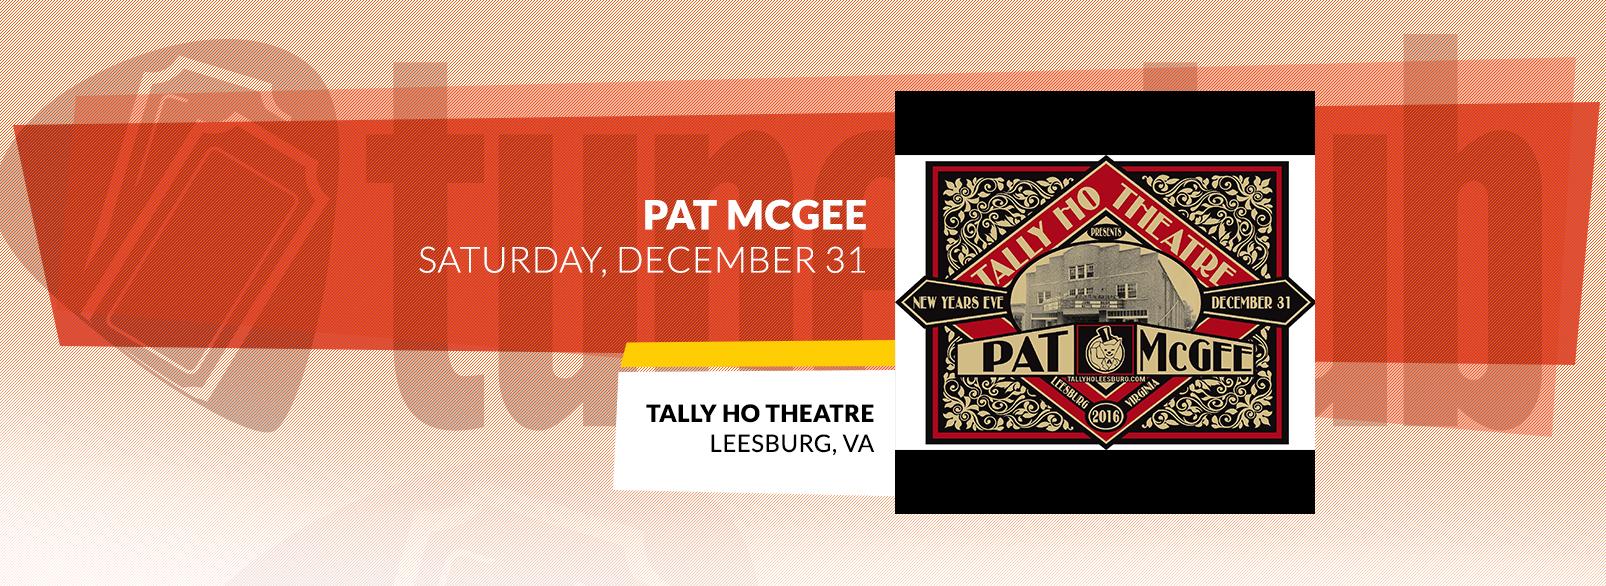 Pat McGee @ Tally Ho Theatre